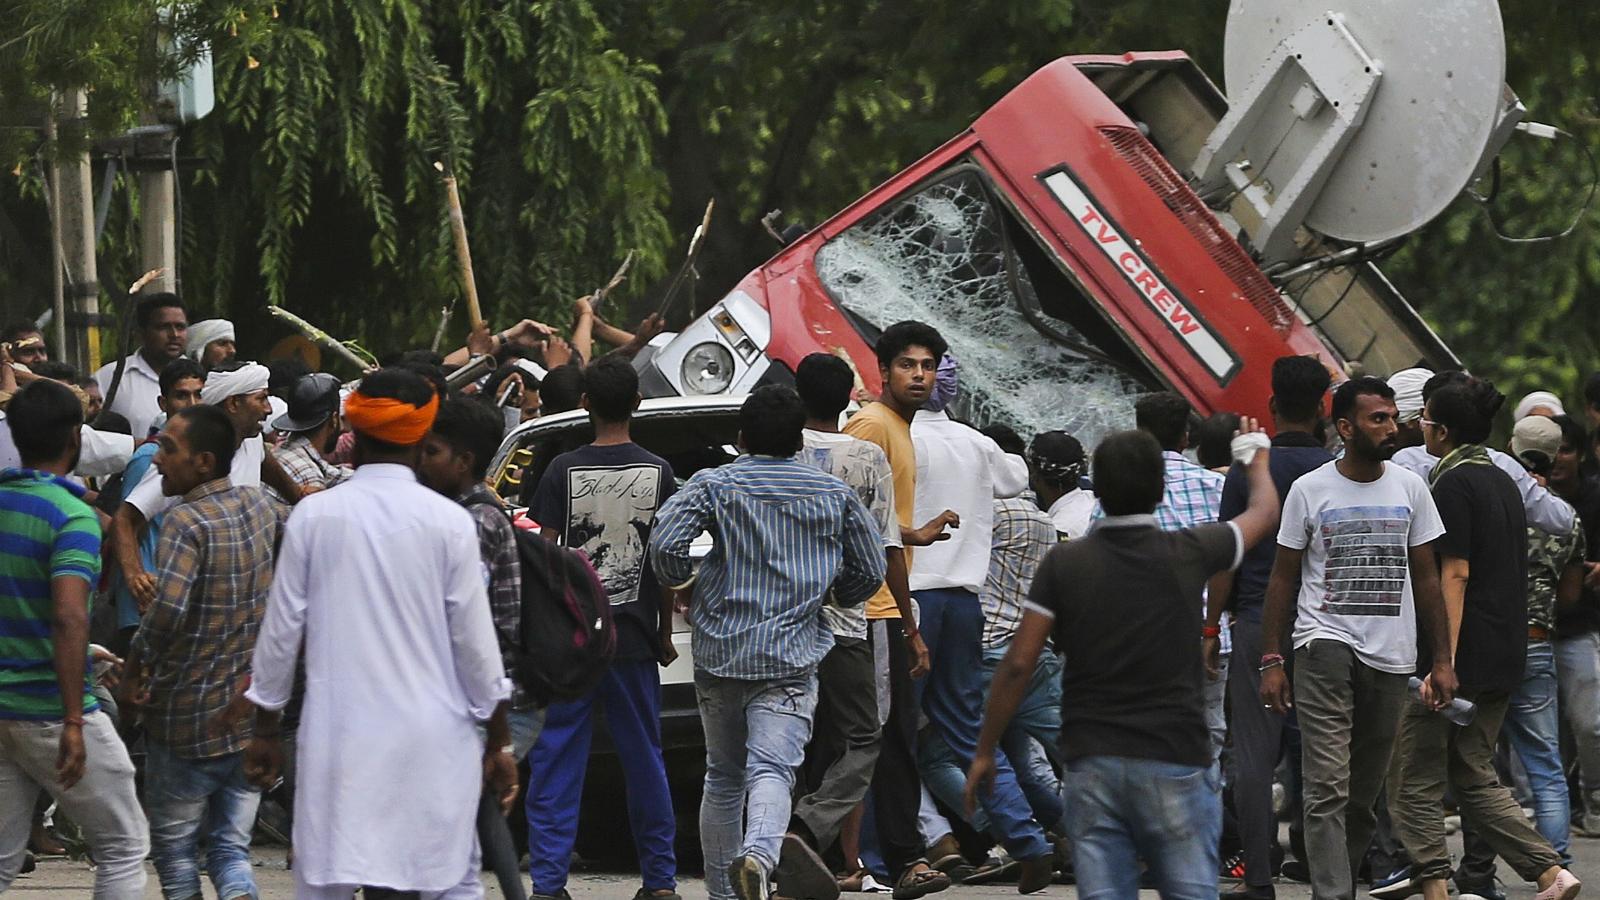 India-Gurmeet Ram Rahim-Dera Sacha Sauda-Rape-Violence-Chandigarh-Panchkula-New Delhi